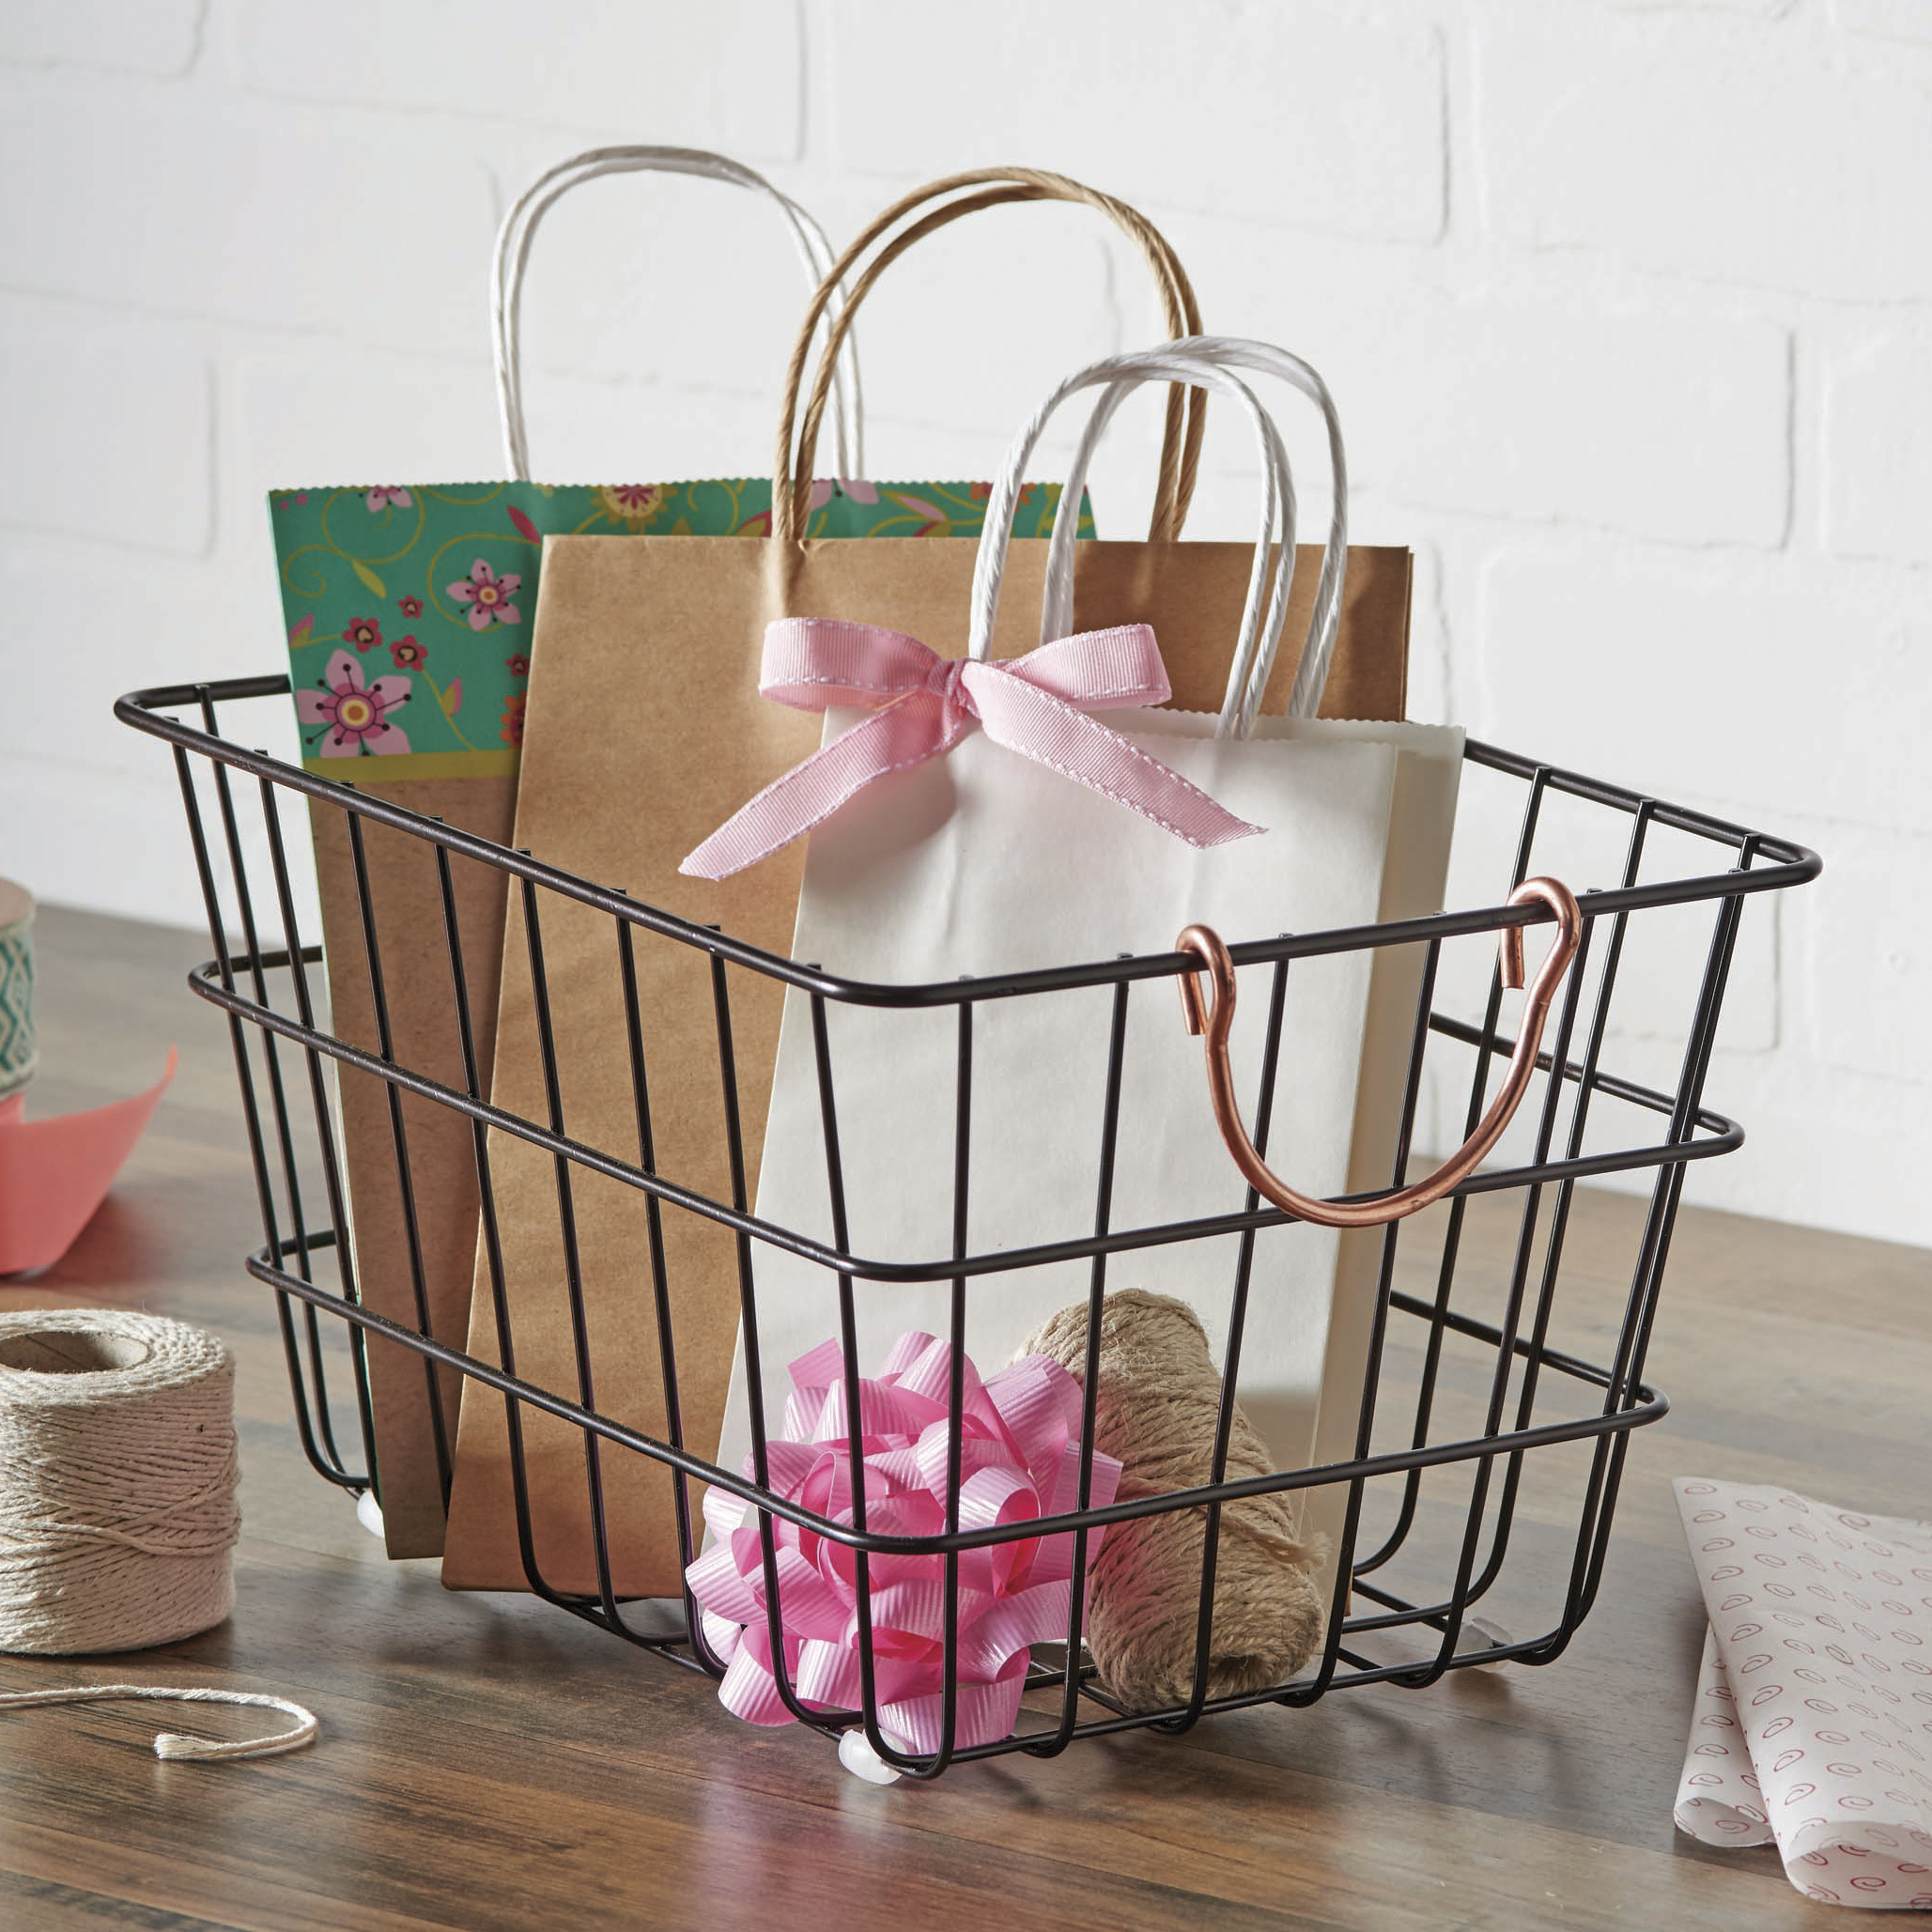 Better Homes & Gardens Medium Wire Basket with Copper Handles